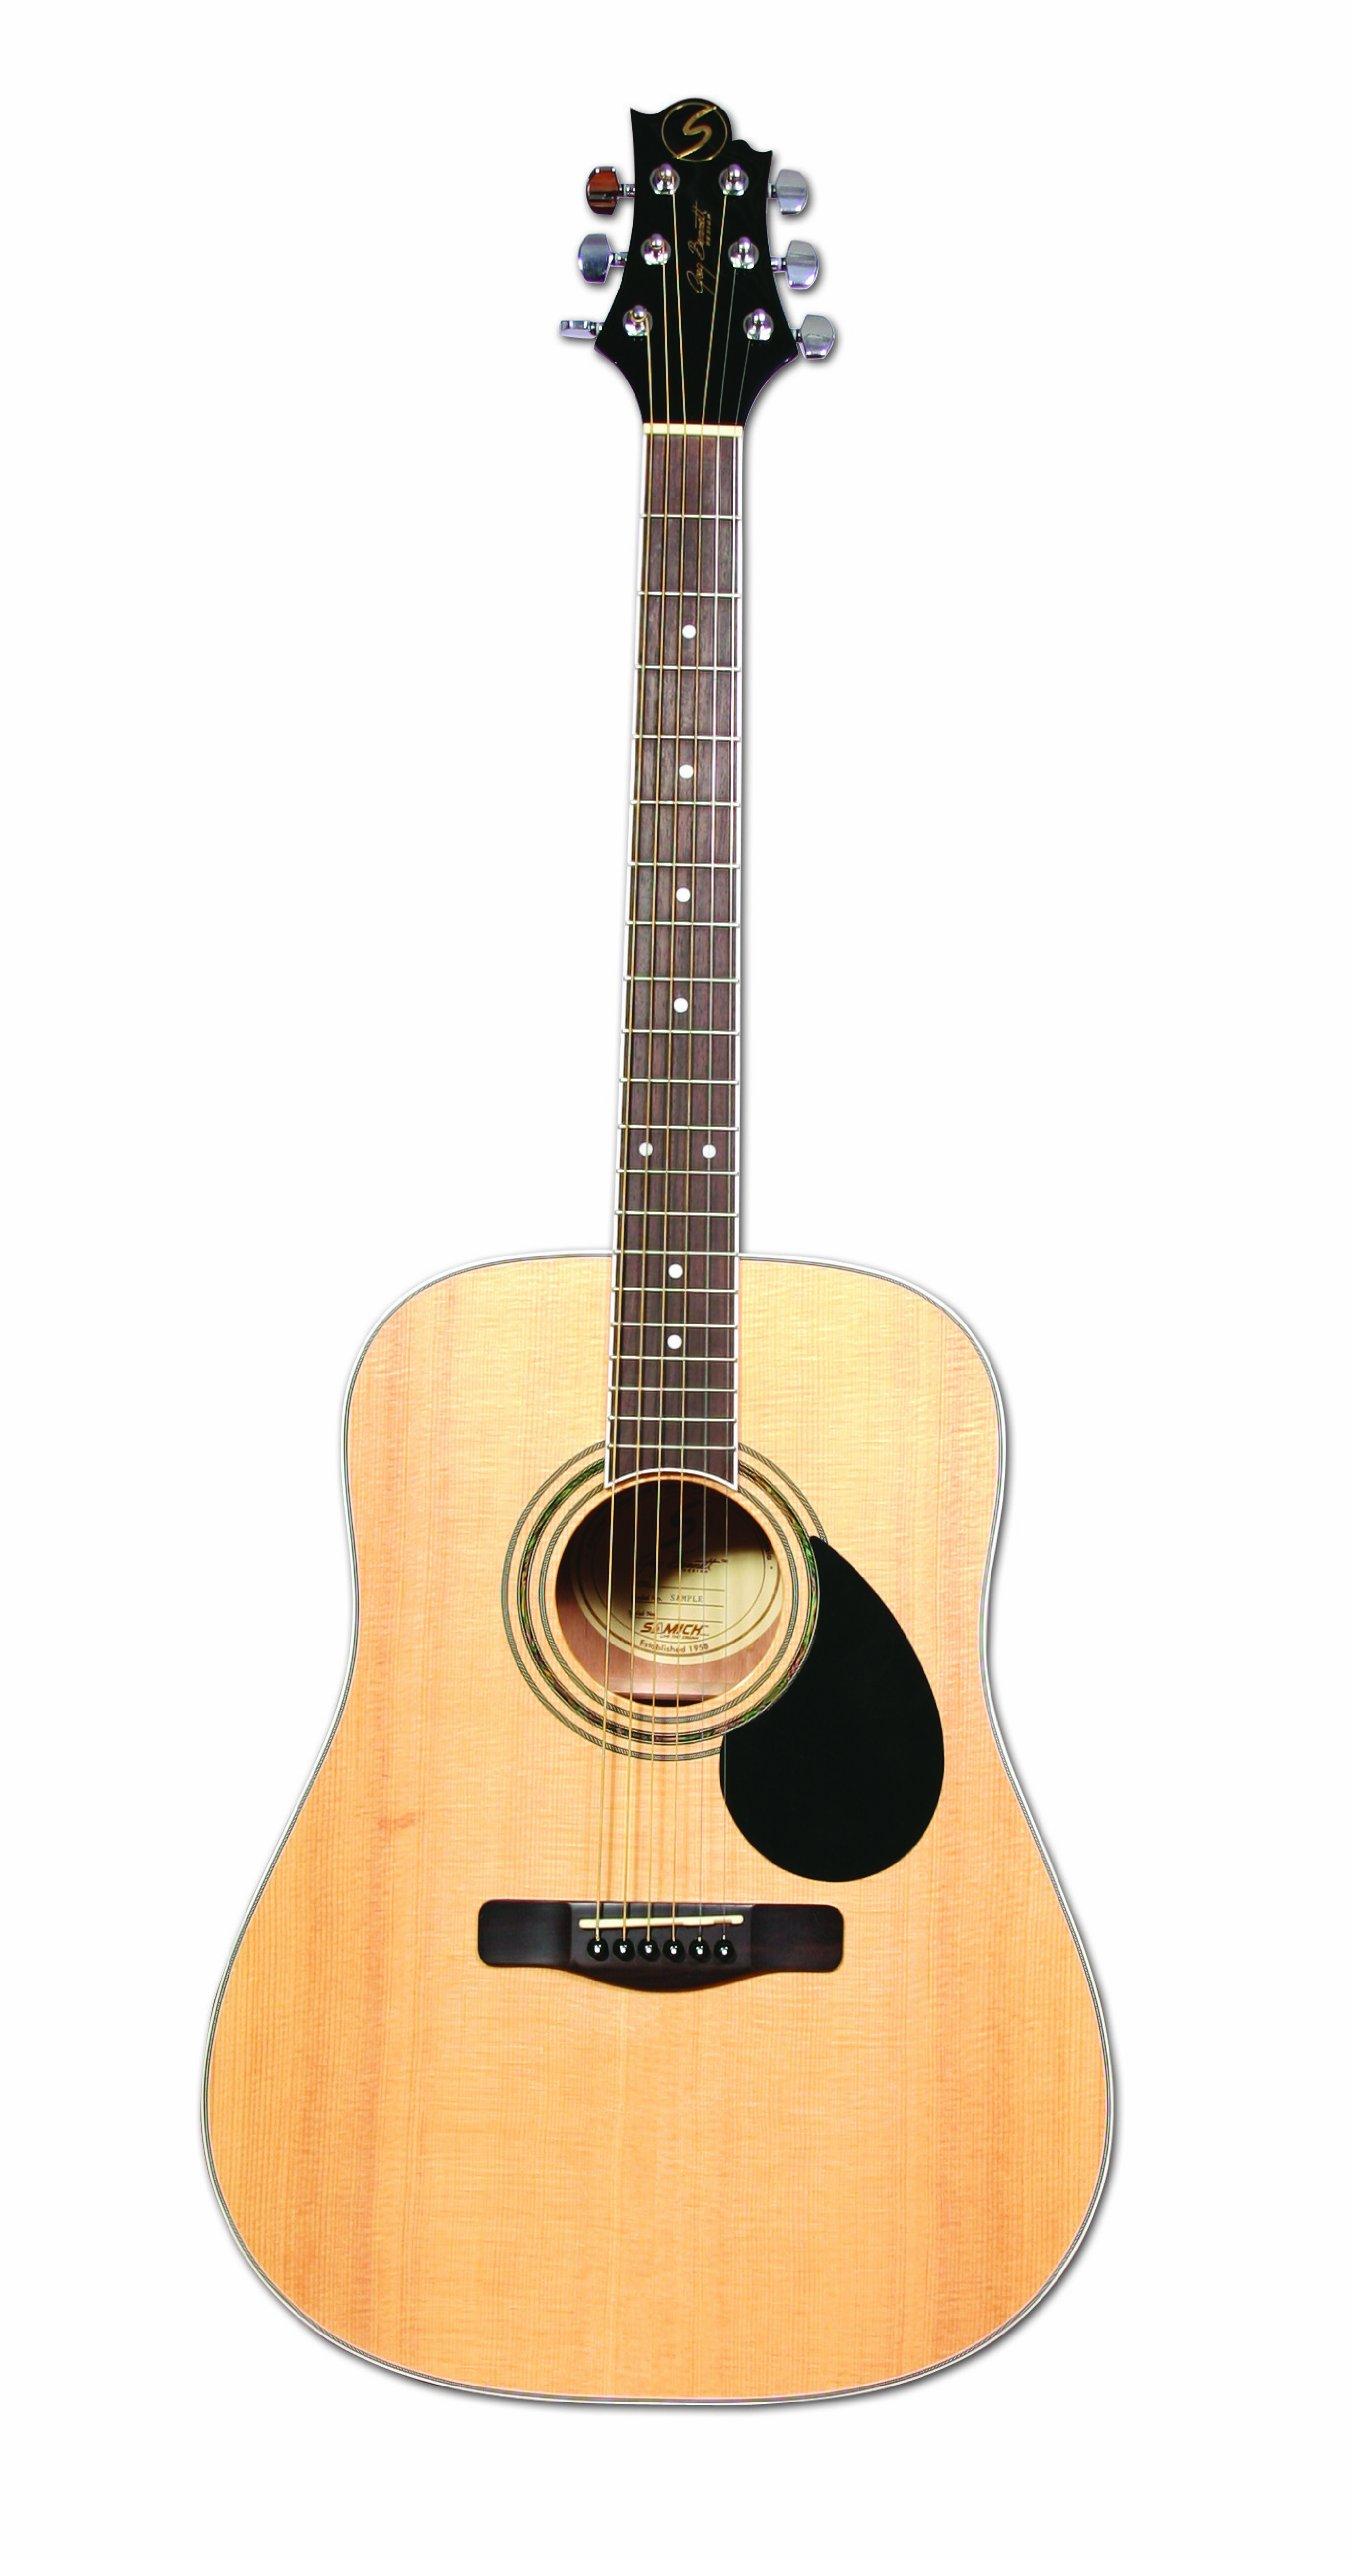 Samick Greg Bennett Design GD100S Acoustic Guitar, Natural by Samick